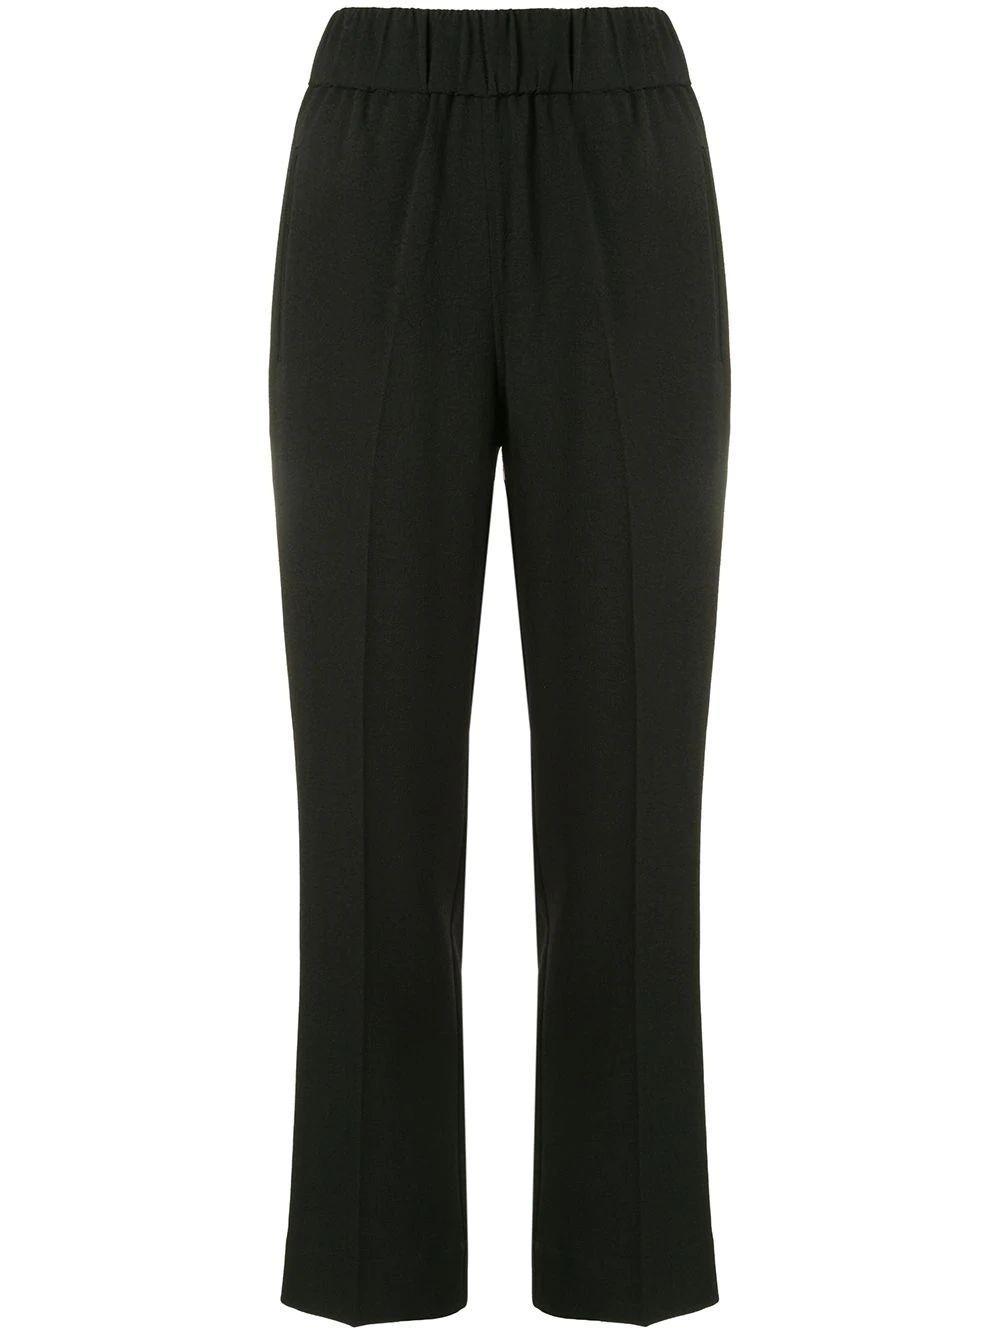 Heavy Crepe Elastic Waist Pants Item # F5072